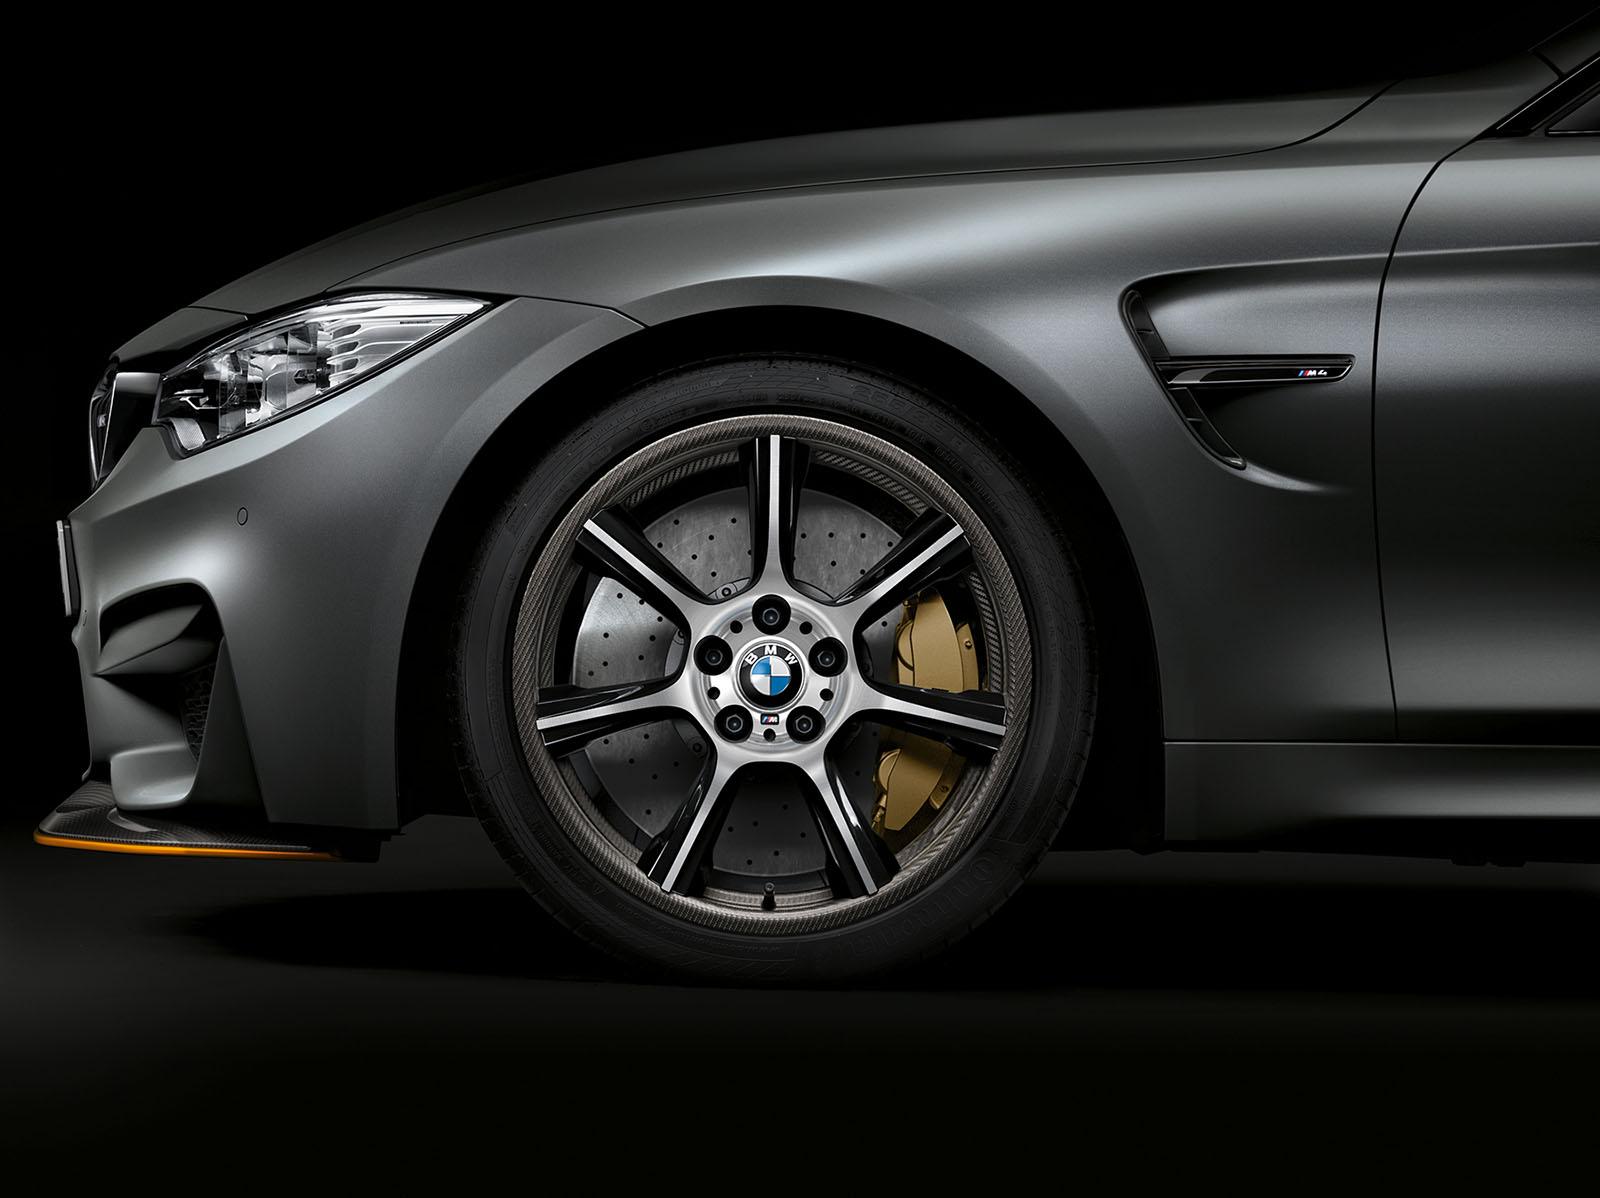 bmw m4 gts carbon fiber wheels 1